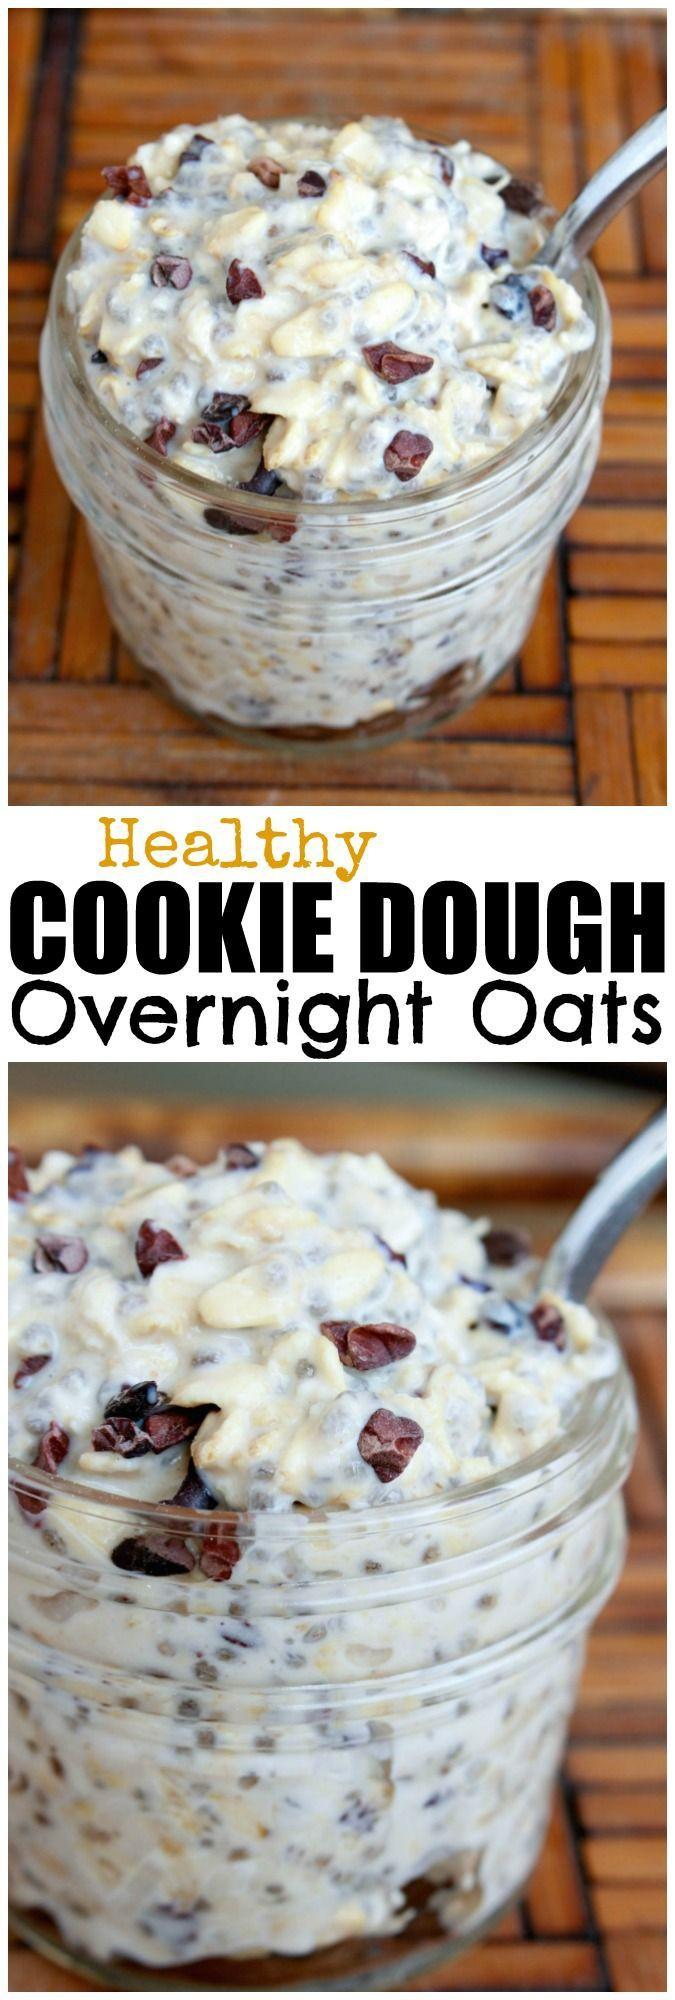 Healthy Overnight Oats Recipes  Best 25 Healthy overnight oats ideas on Pinterest